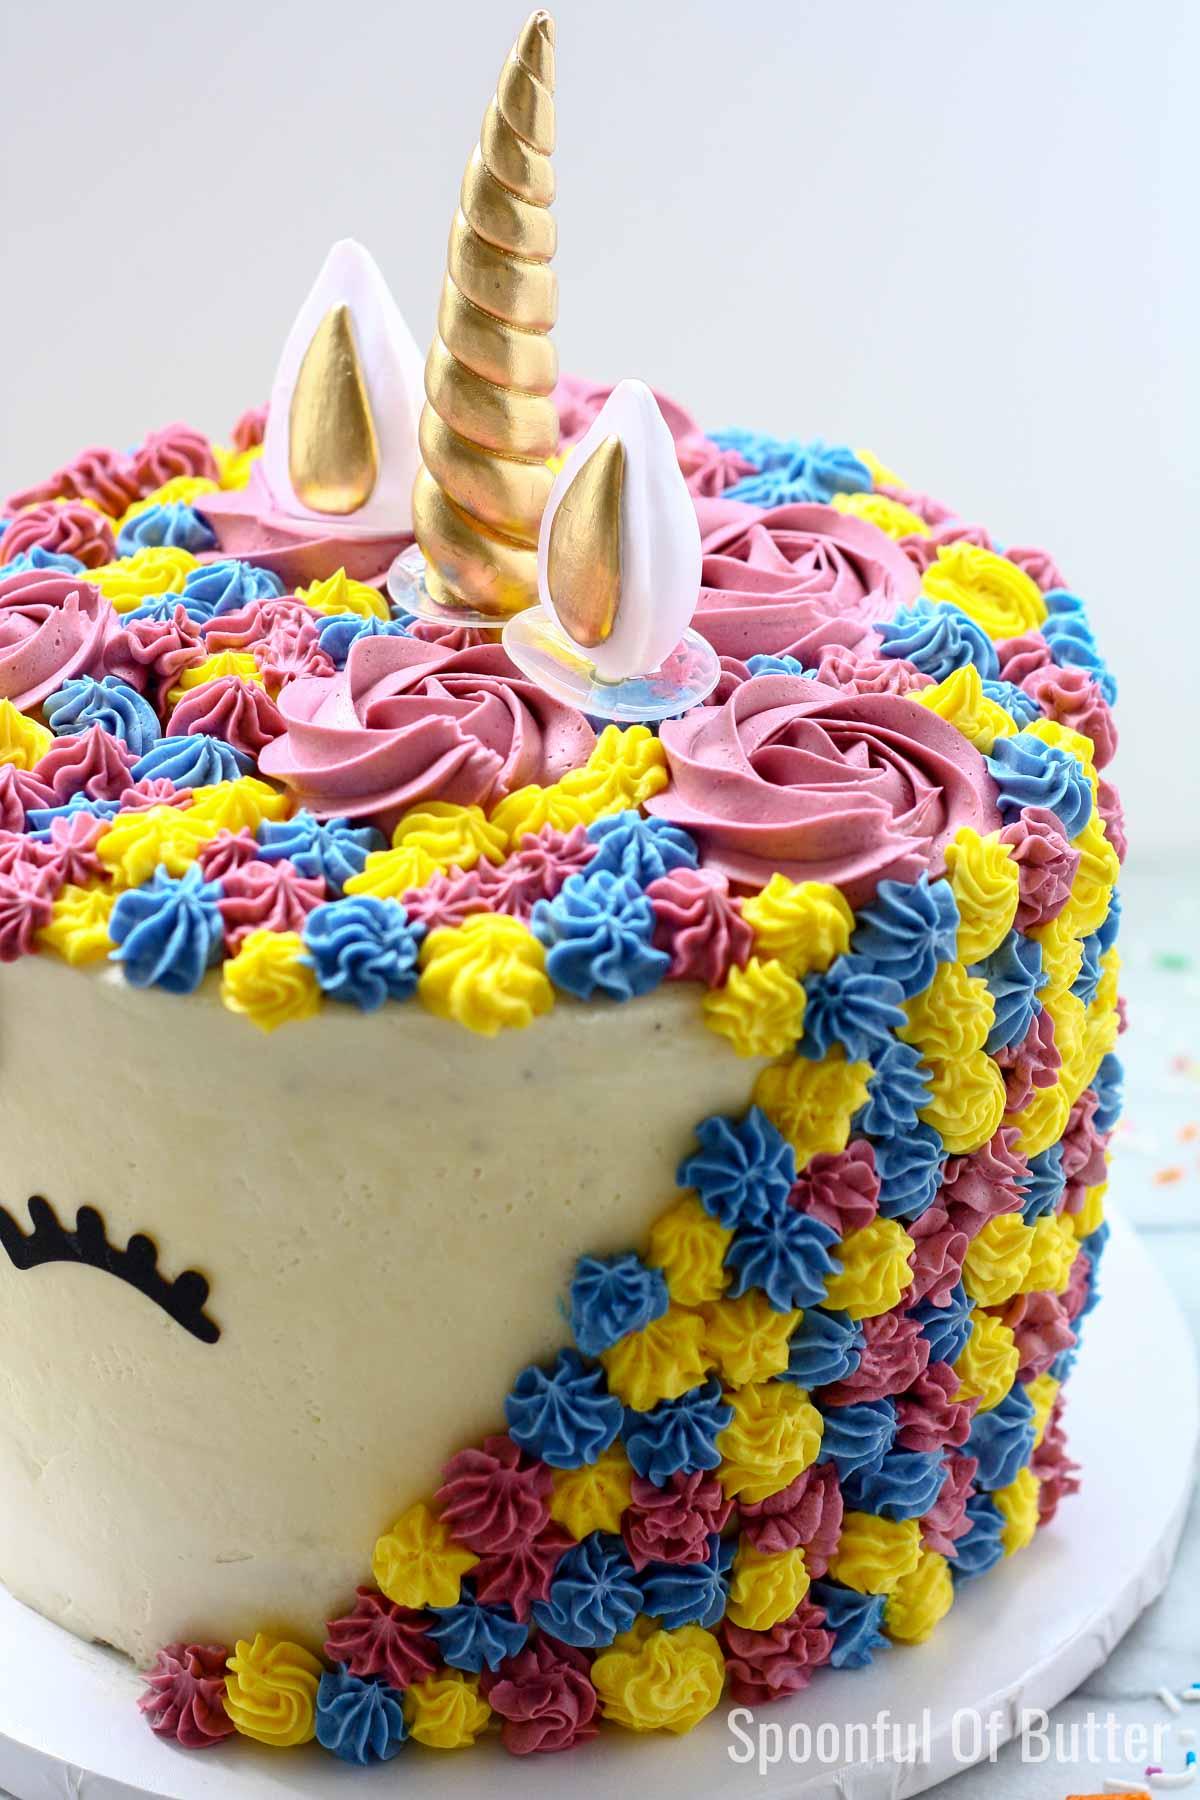 DIY Birthday Unicorn Cake 2 - an easy way to make unicorn birthday cake.